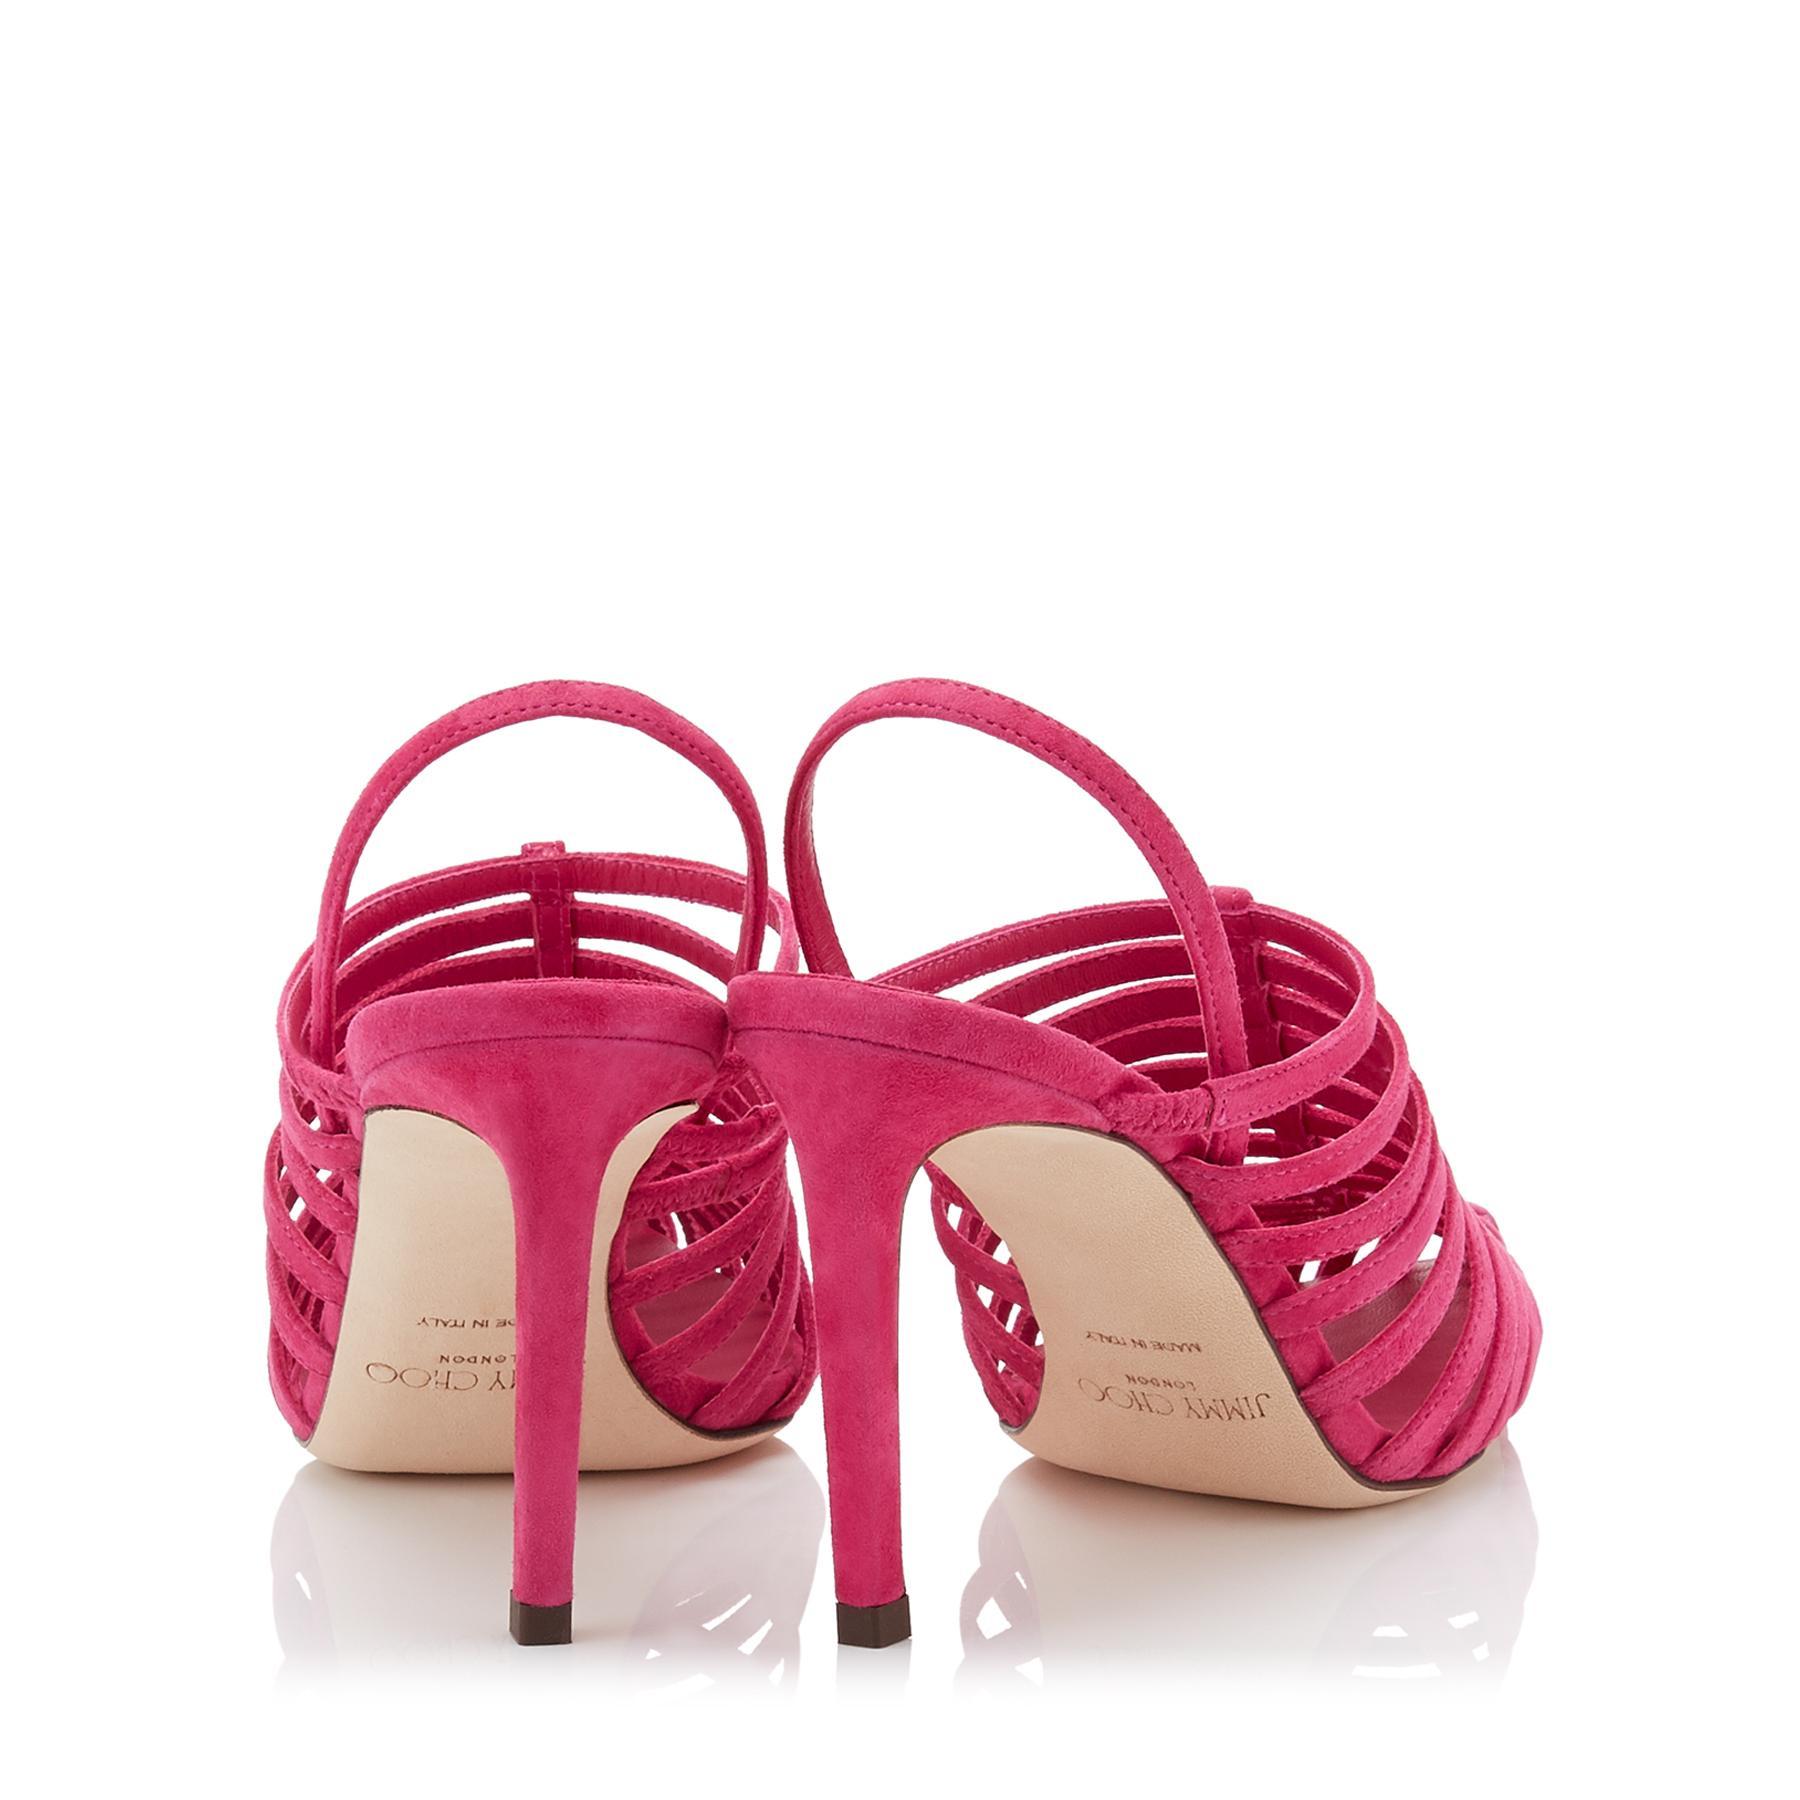 5ae53864d84 Jimmy Choo - Pink Thu 85 Raspberry Suede Sling Back Heel With Horizontal  Straps - Lyst. View fullscreen